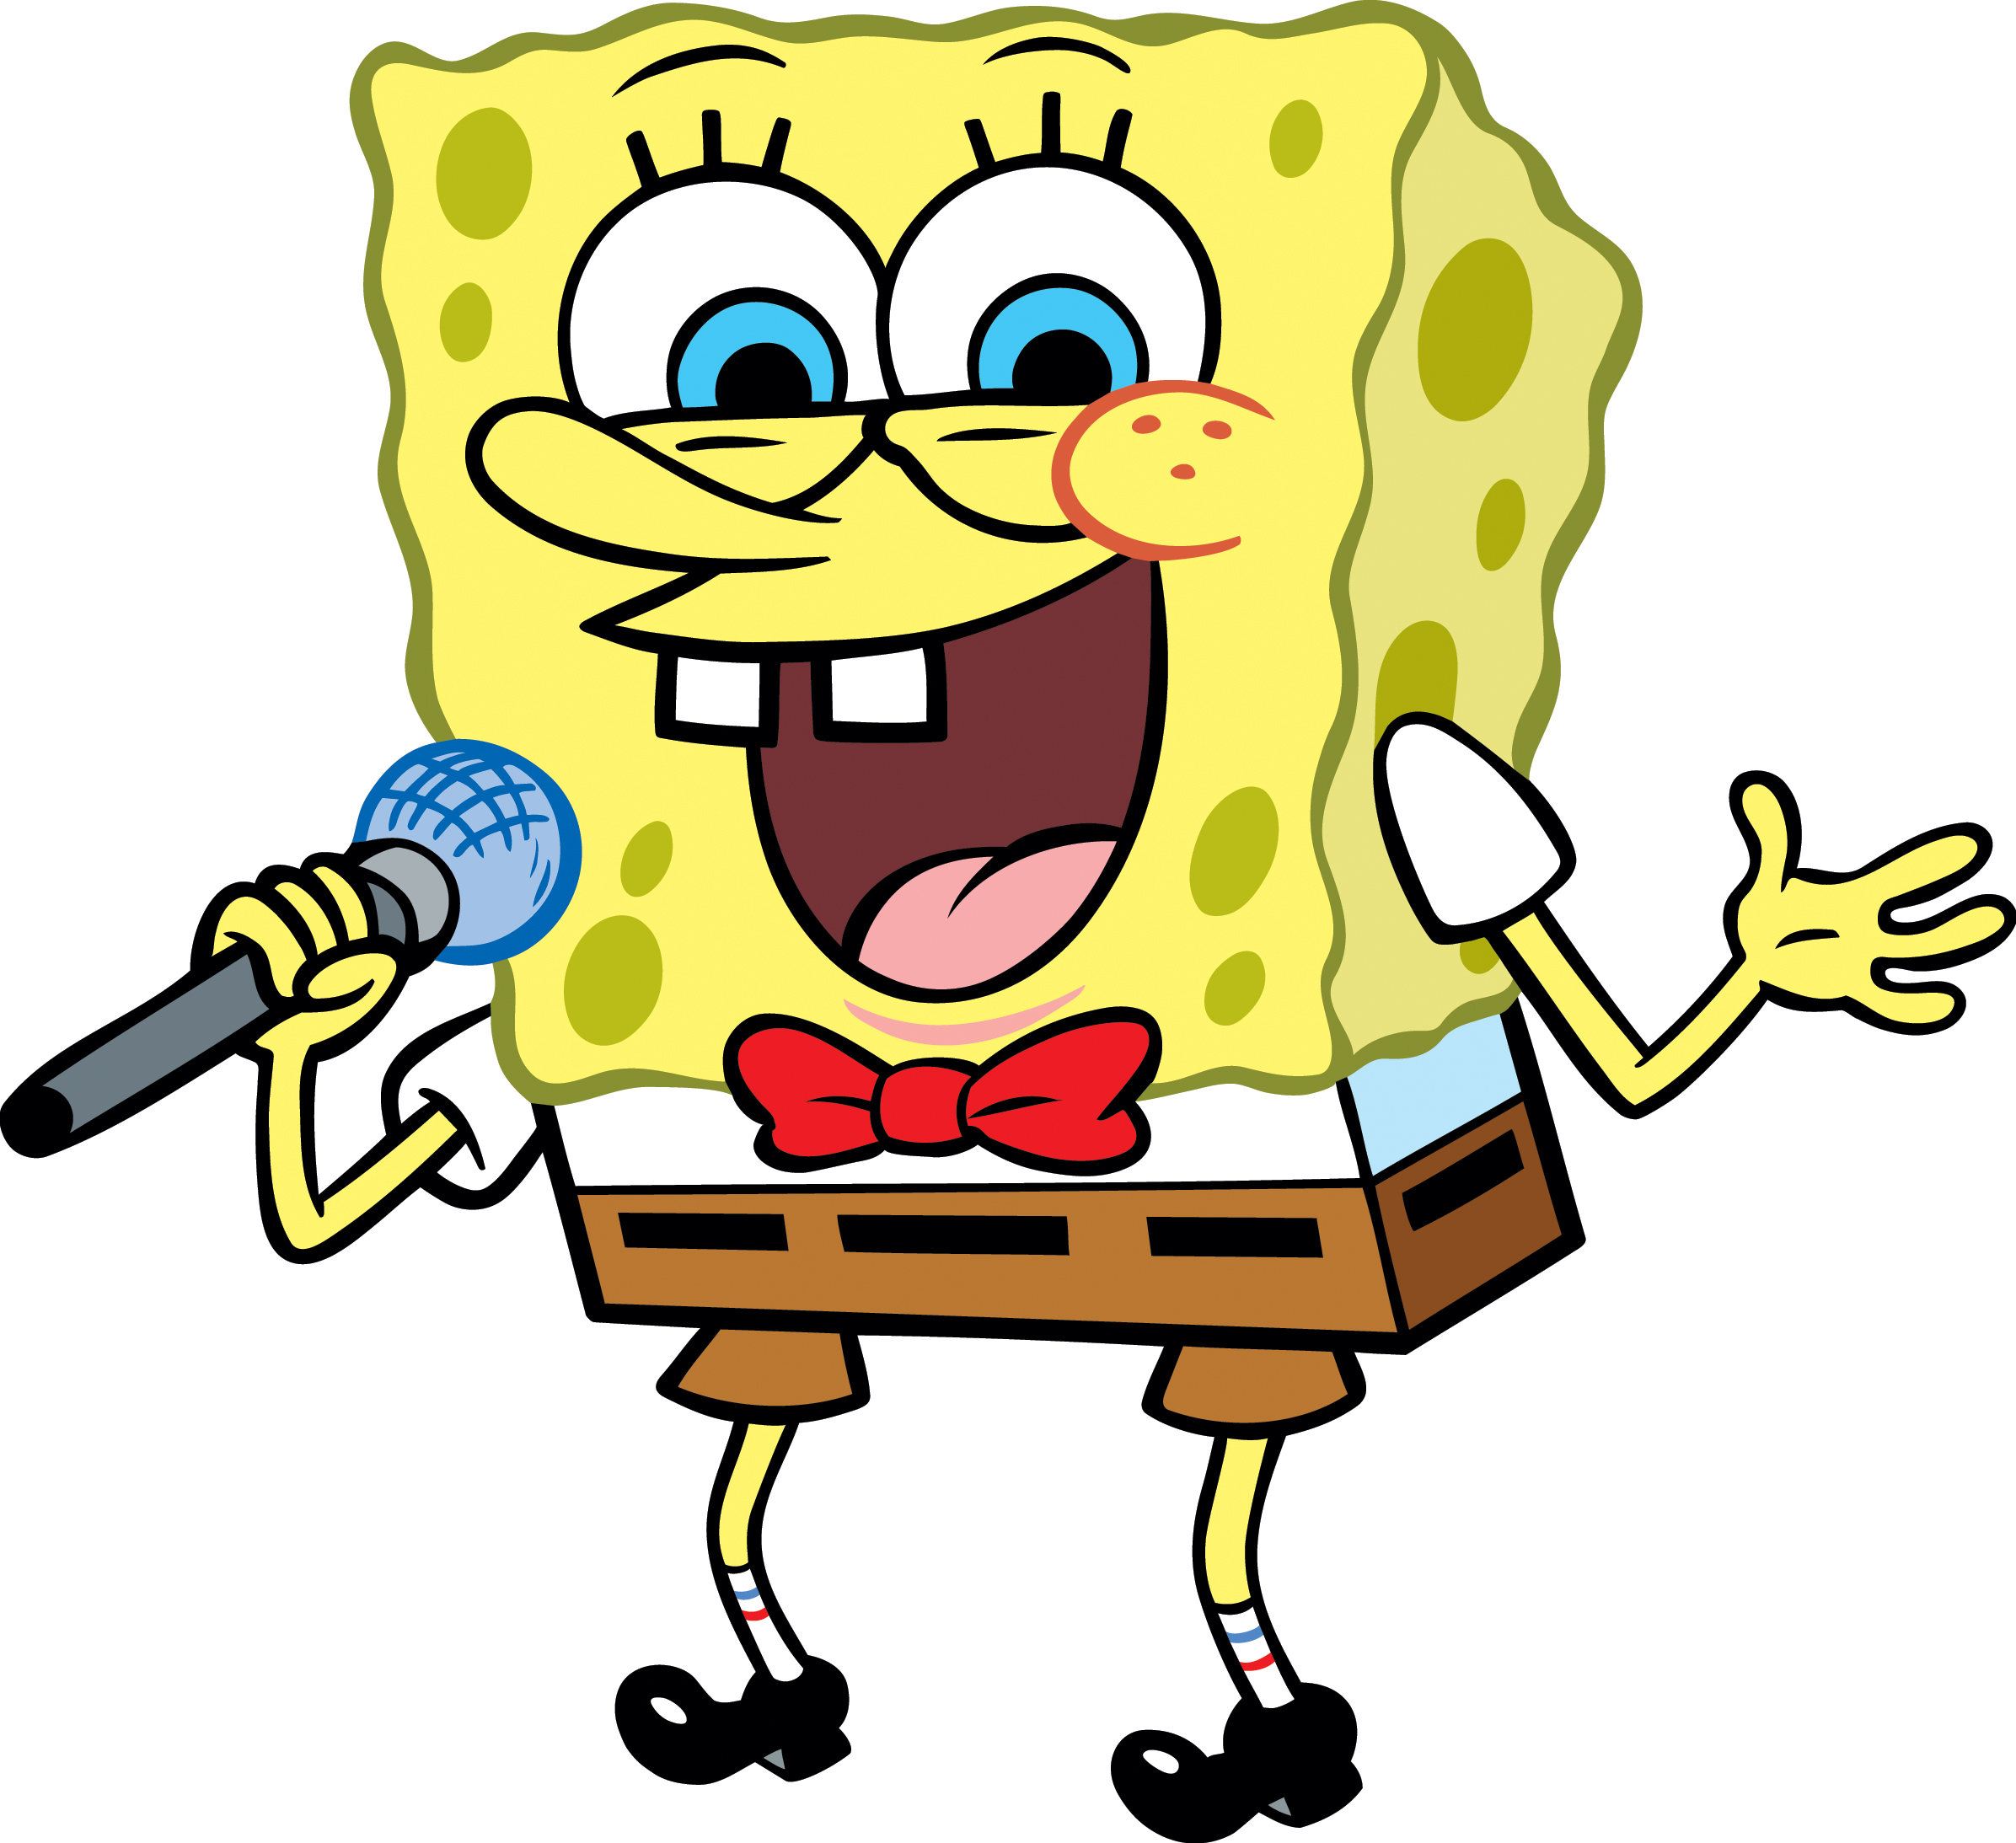 spongebob squarepants character nickelodeon fandom powered